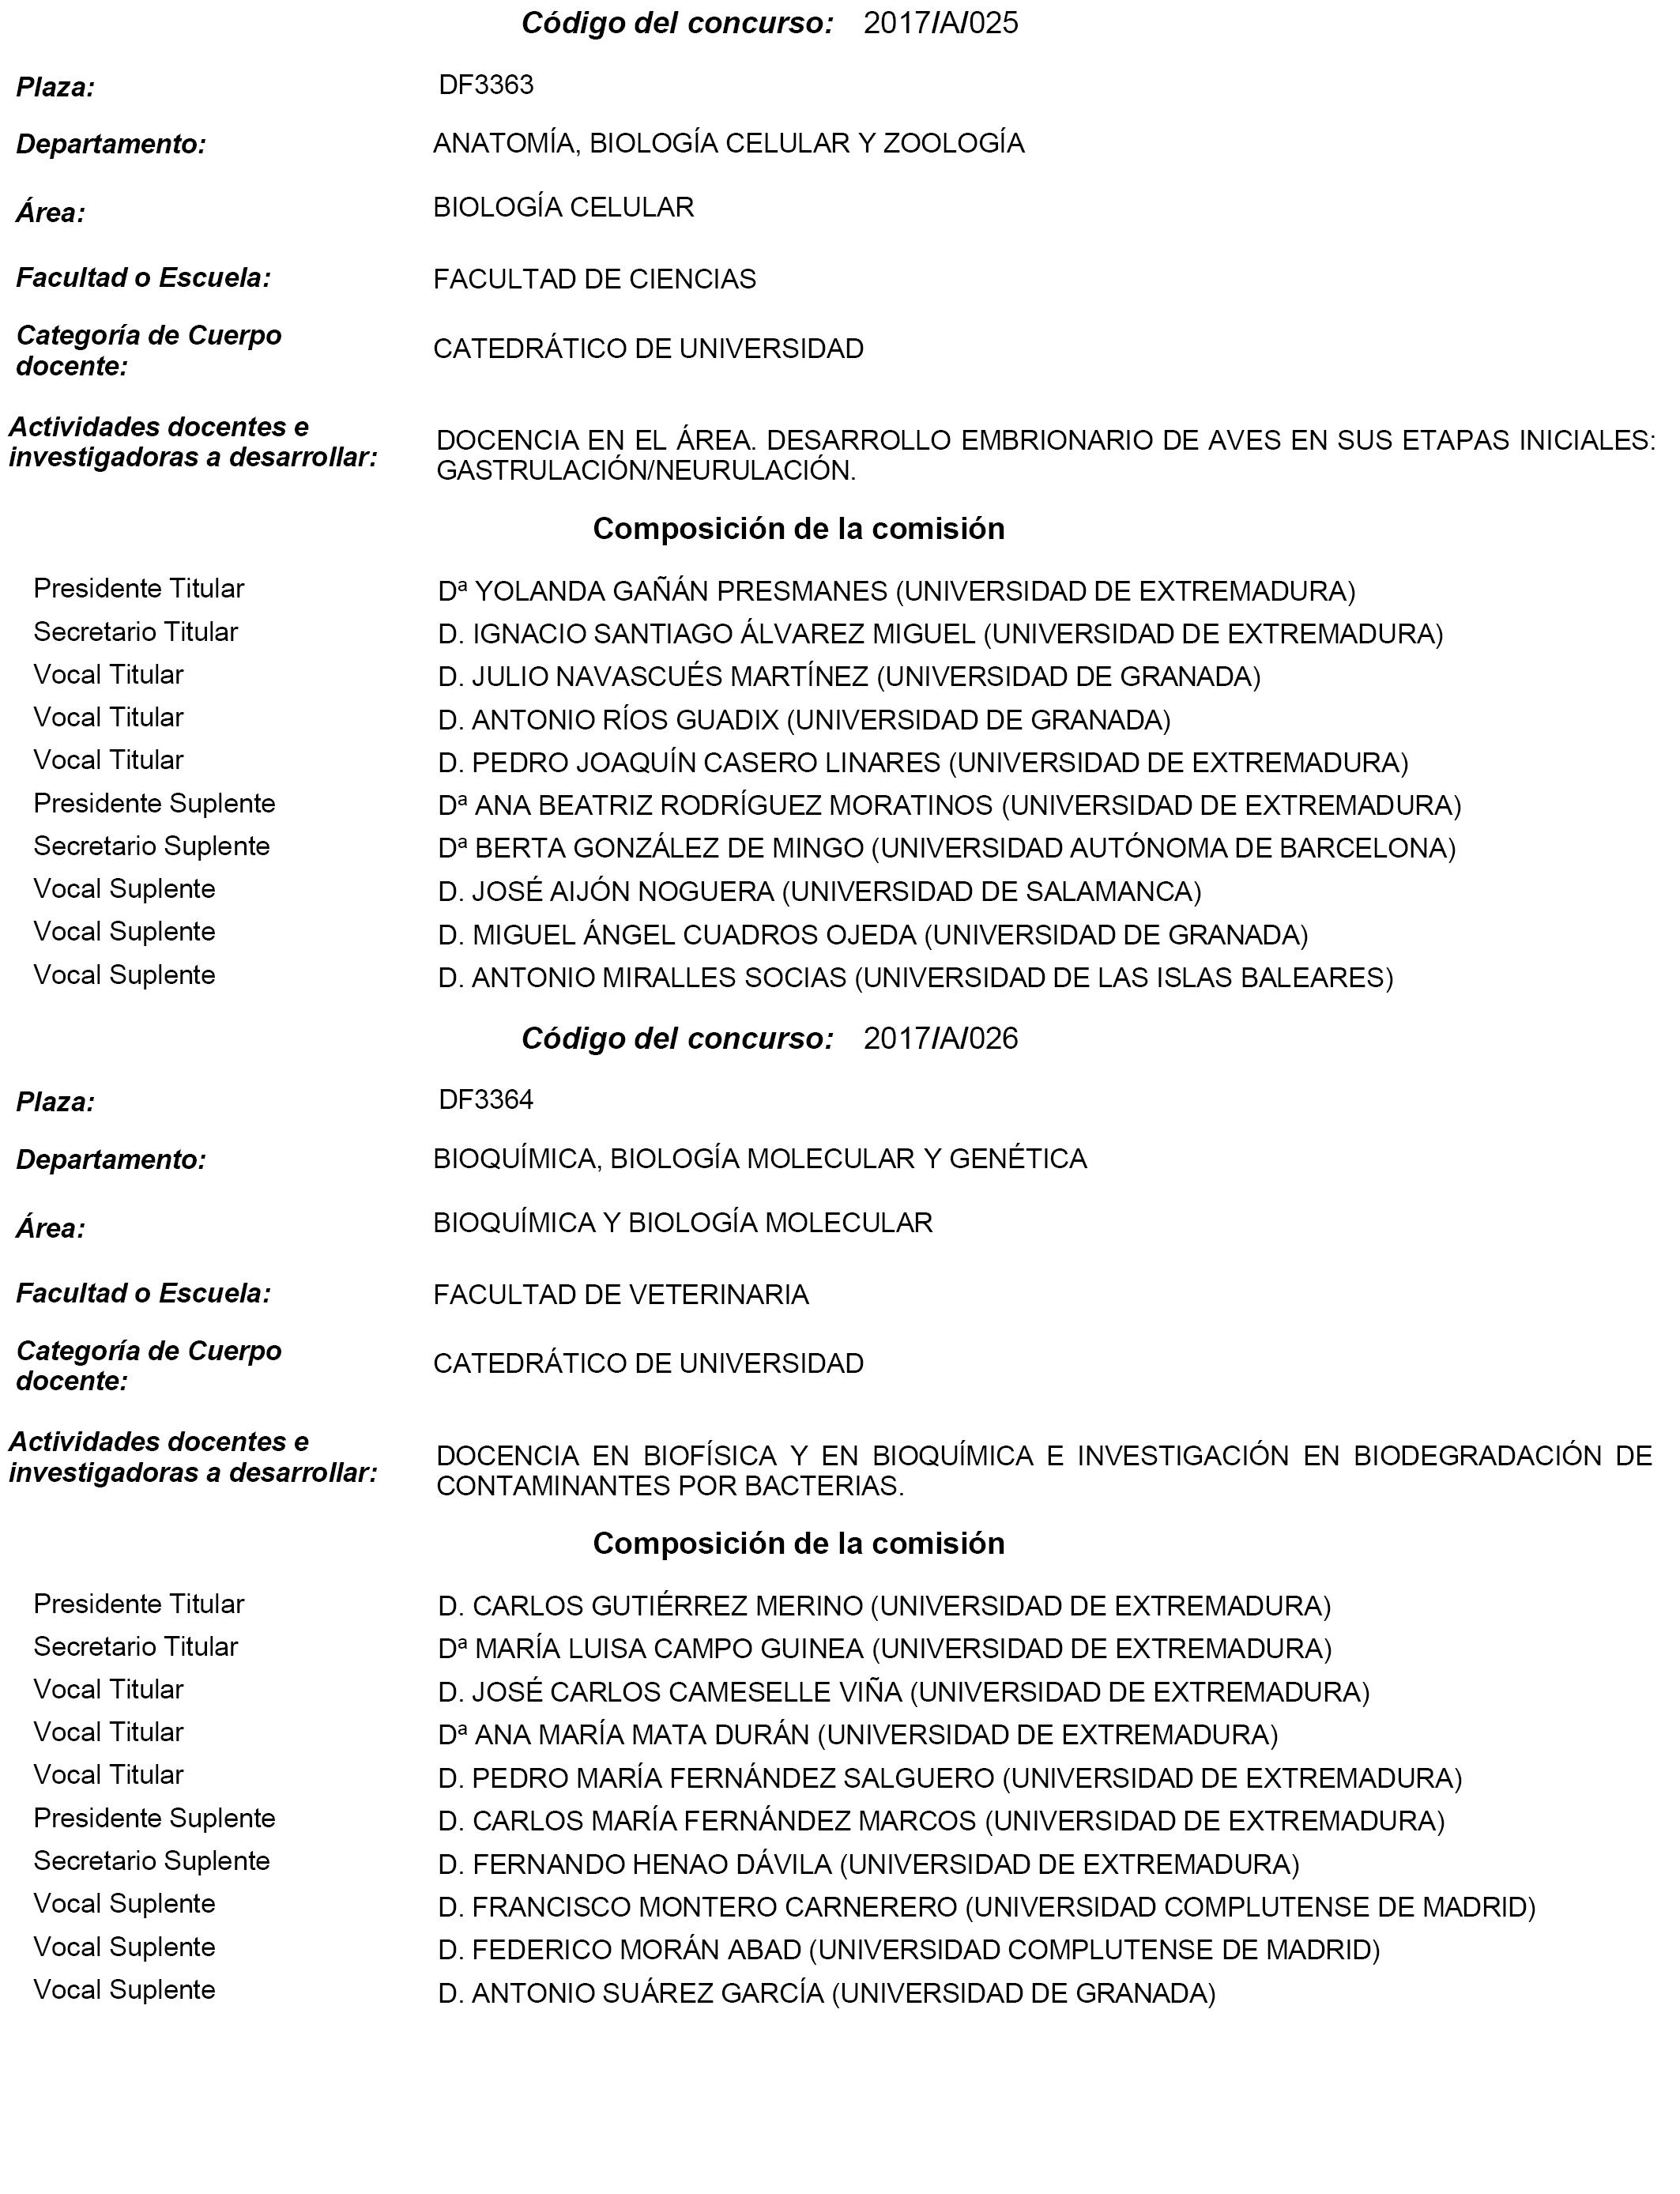 BOE.es - Documento BOE-A-2018-4566